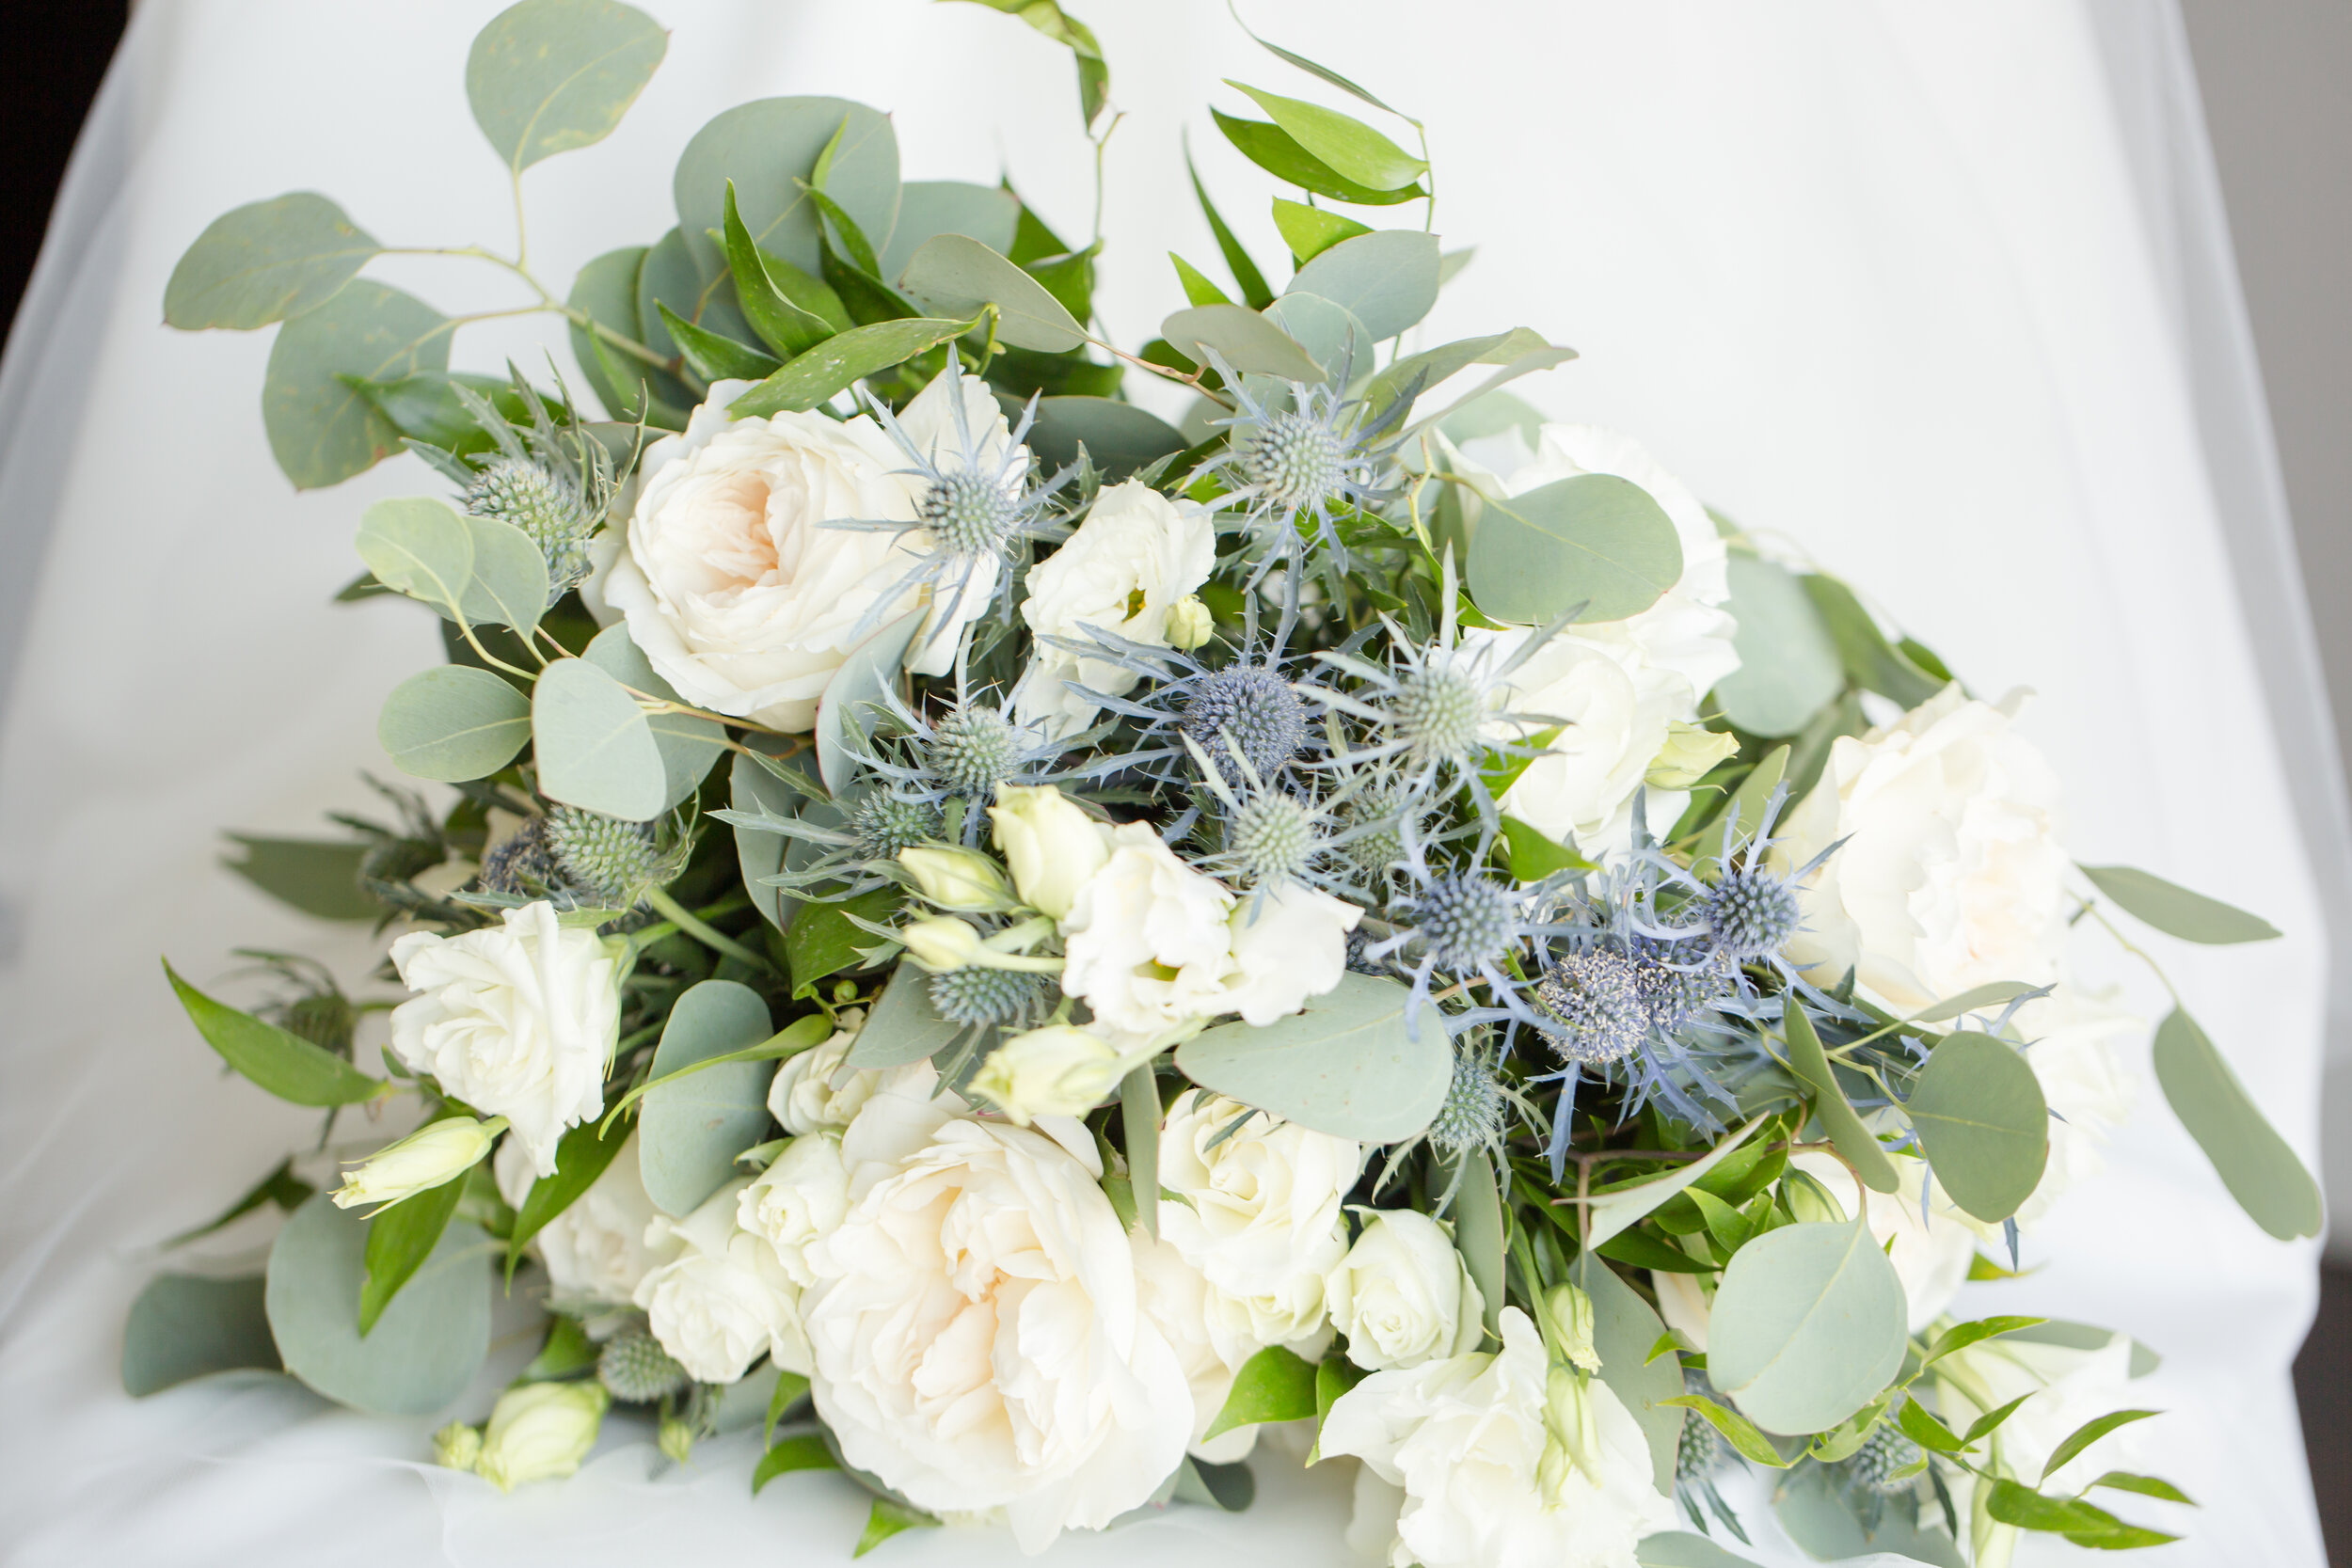 ivory-and-beau-bride-wedding-dresses-bridal-boutique-bridal-shop-savannah-wedding-shop-DGP_SohoSouthCafe_Swanagin-Mullis-10.JPG